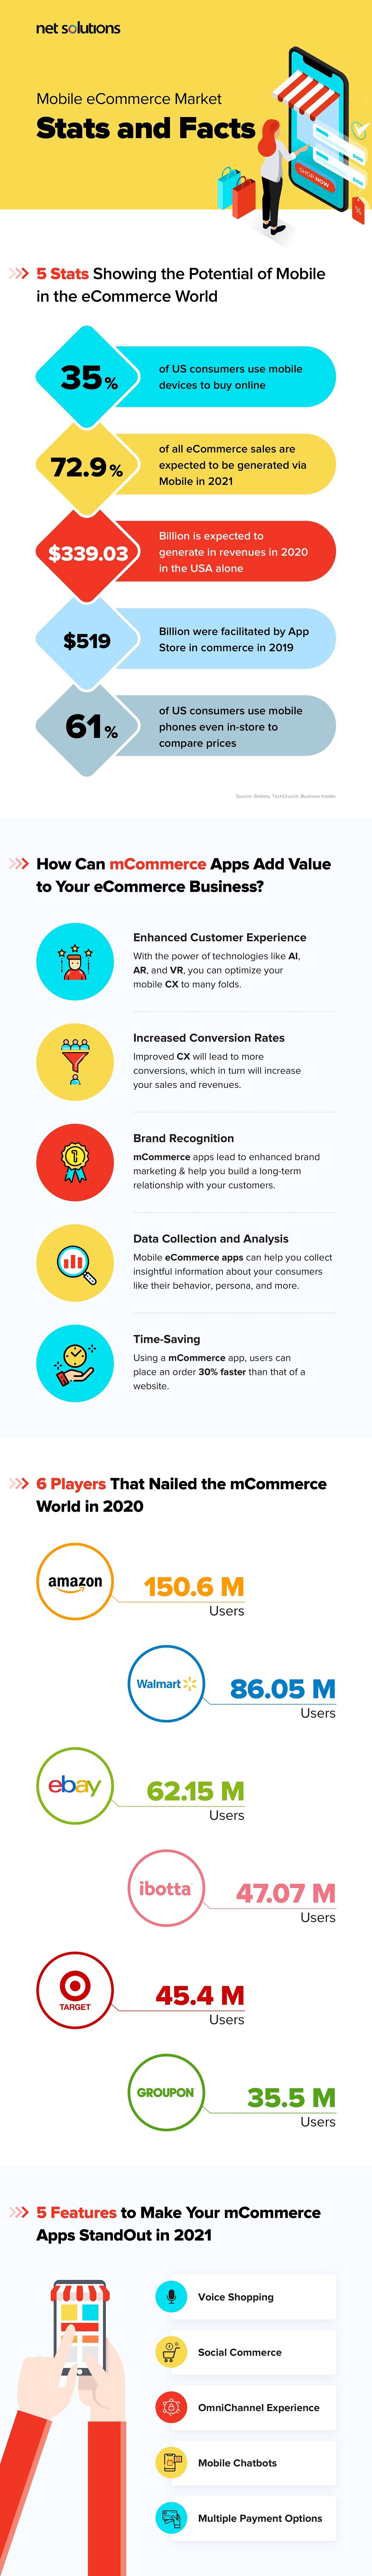 Mobile eCommerce Market Infographic